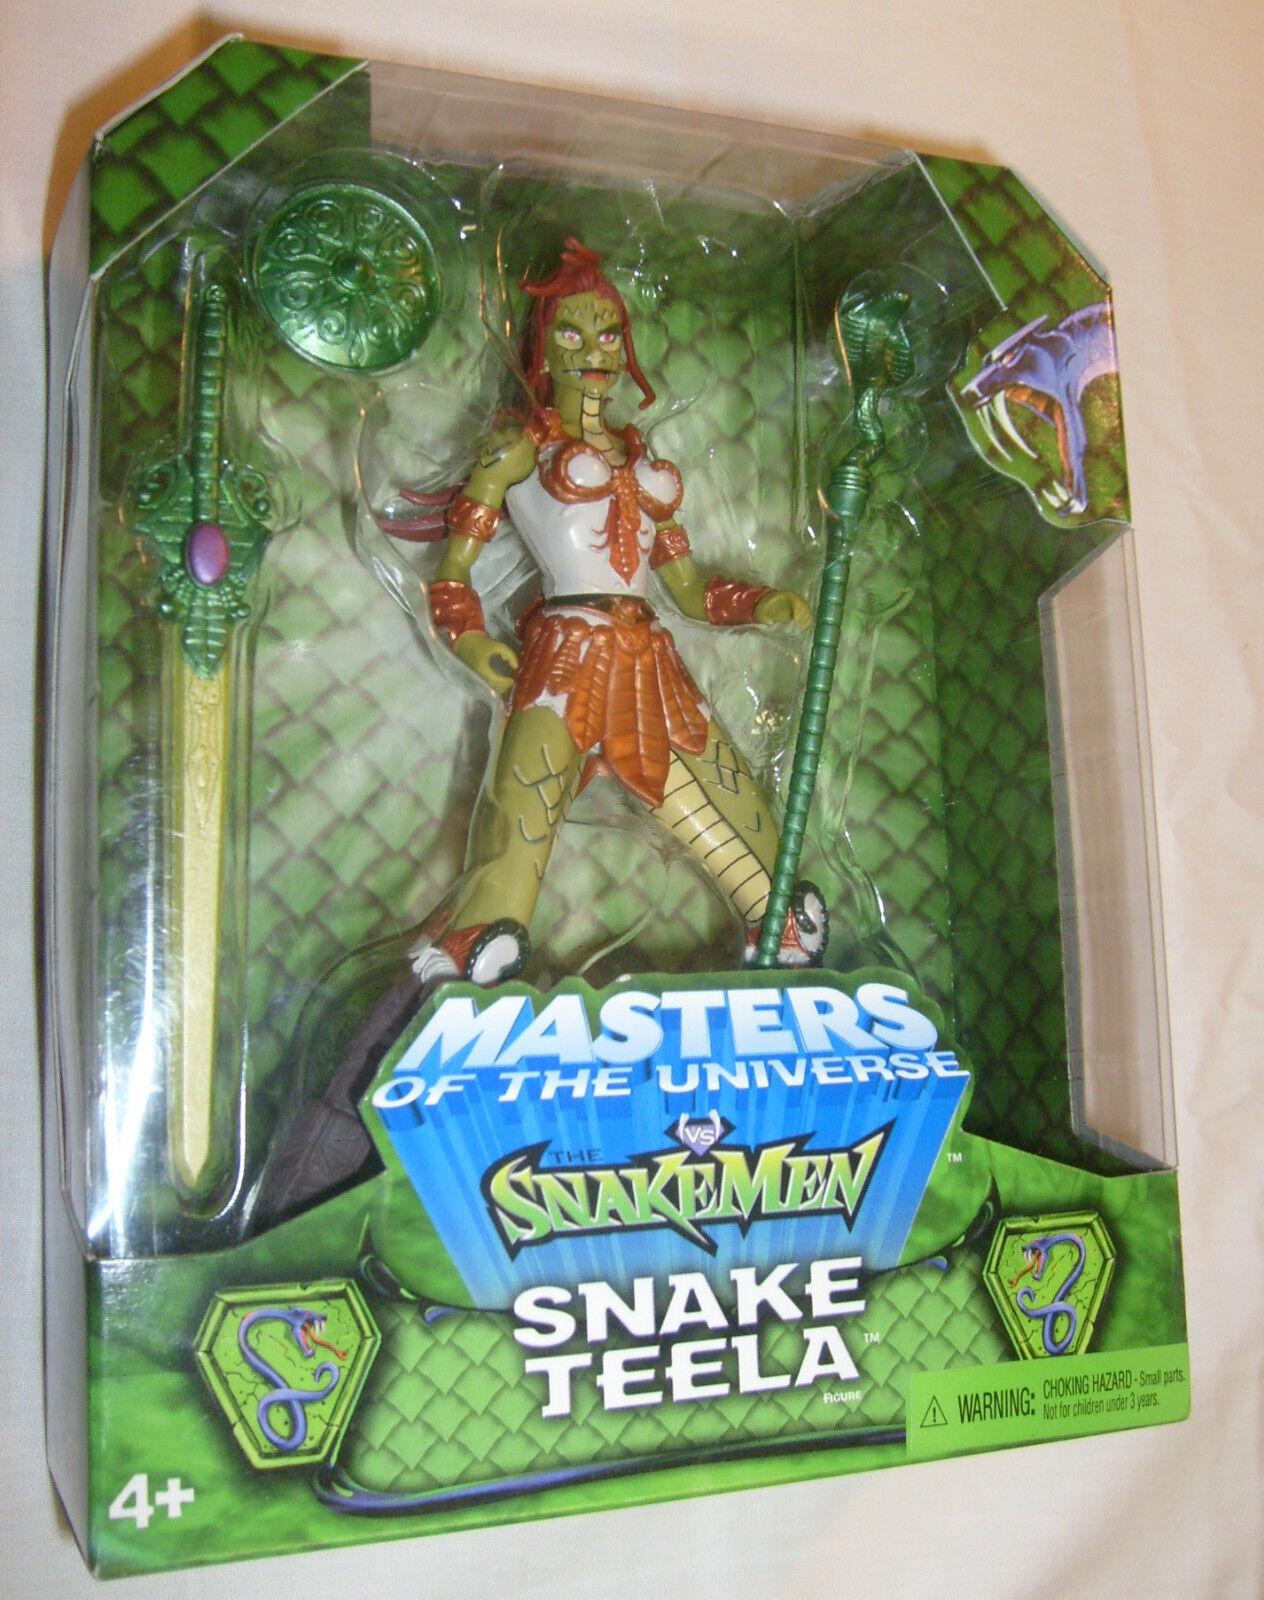 MOTU Green Card Snakemen 200X SNAKE TEELA Toyfair Exclusive Figure MOC FREE S H